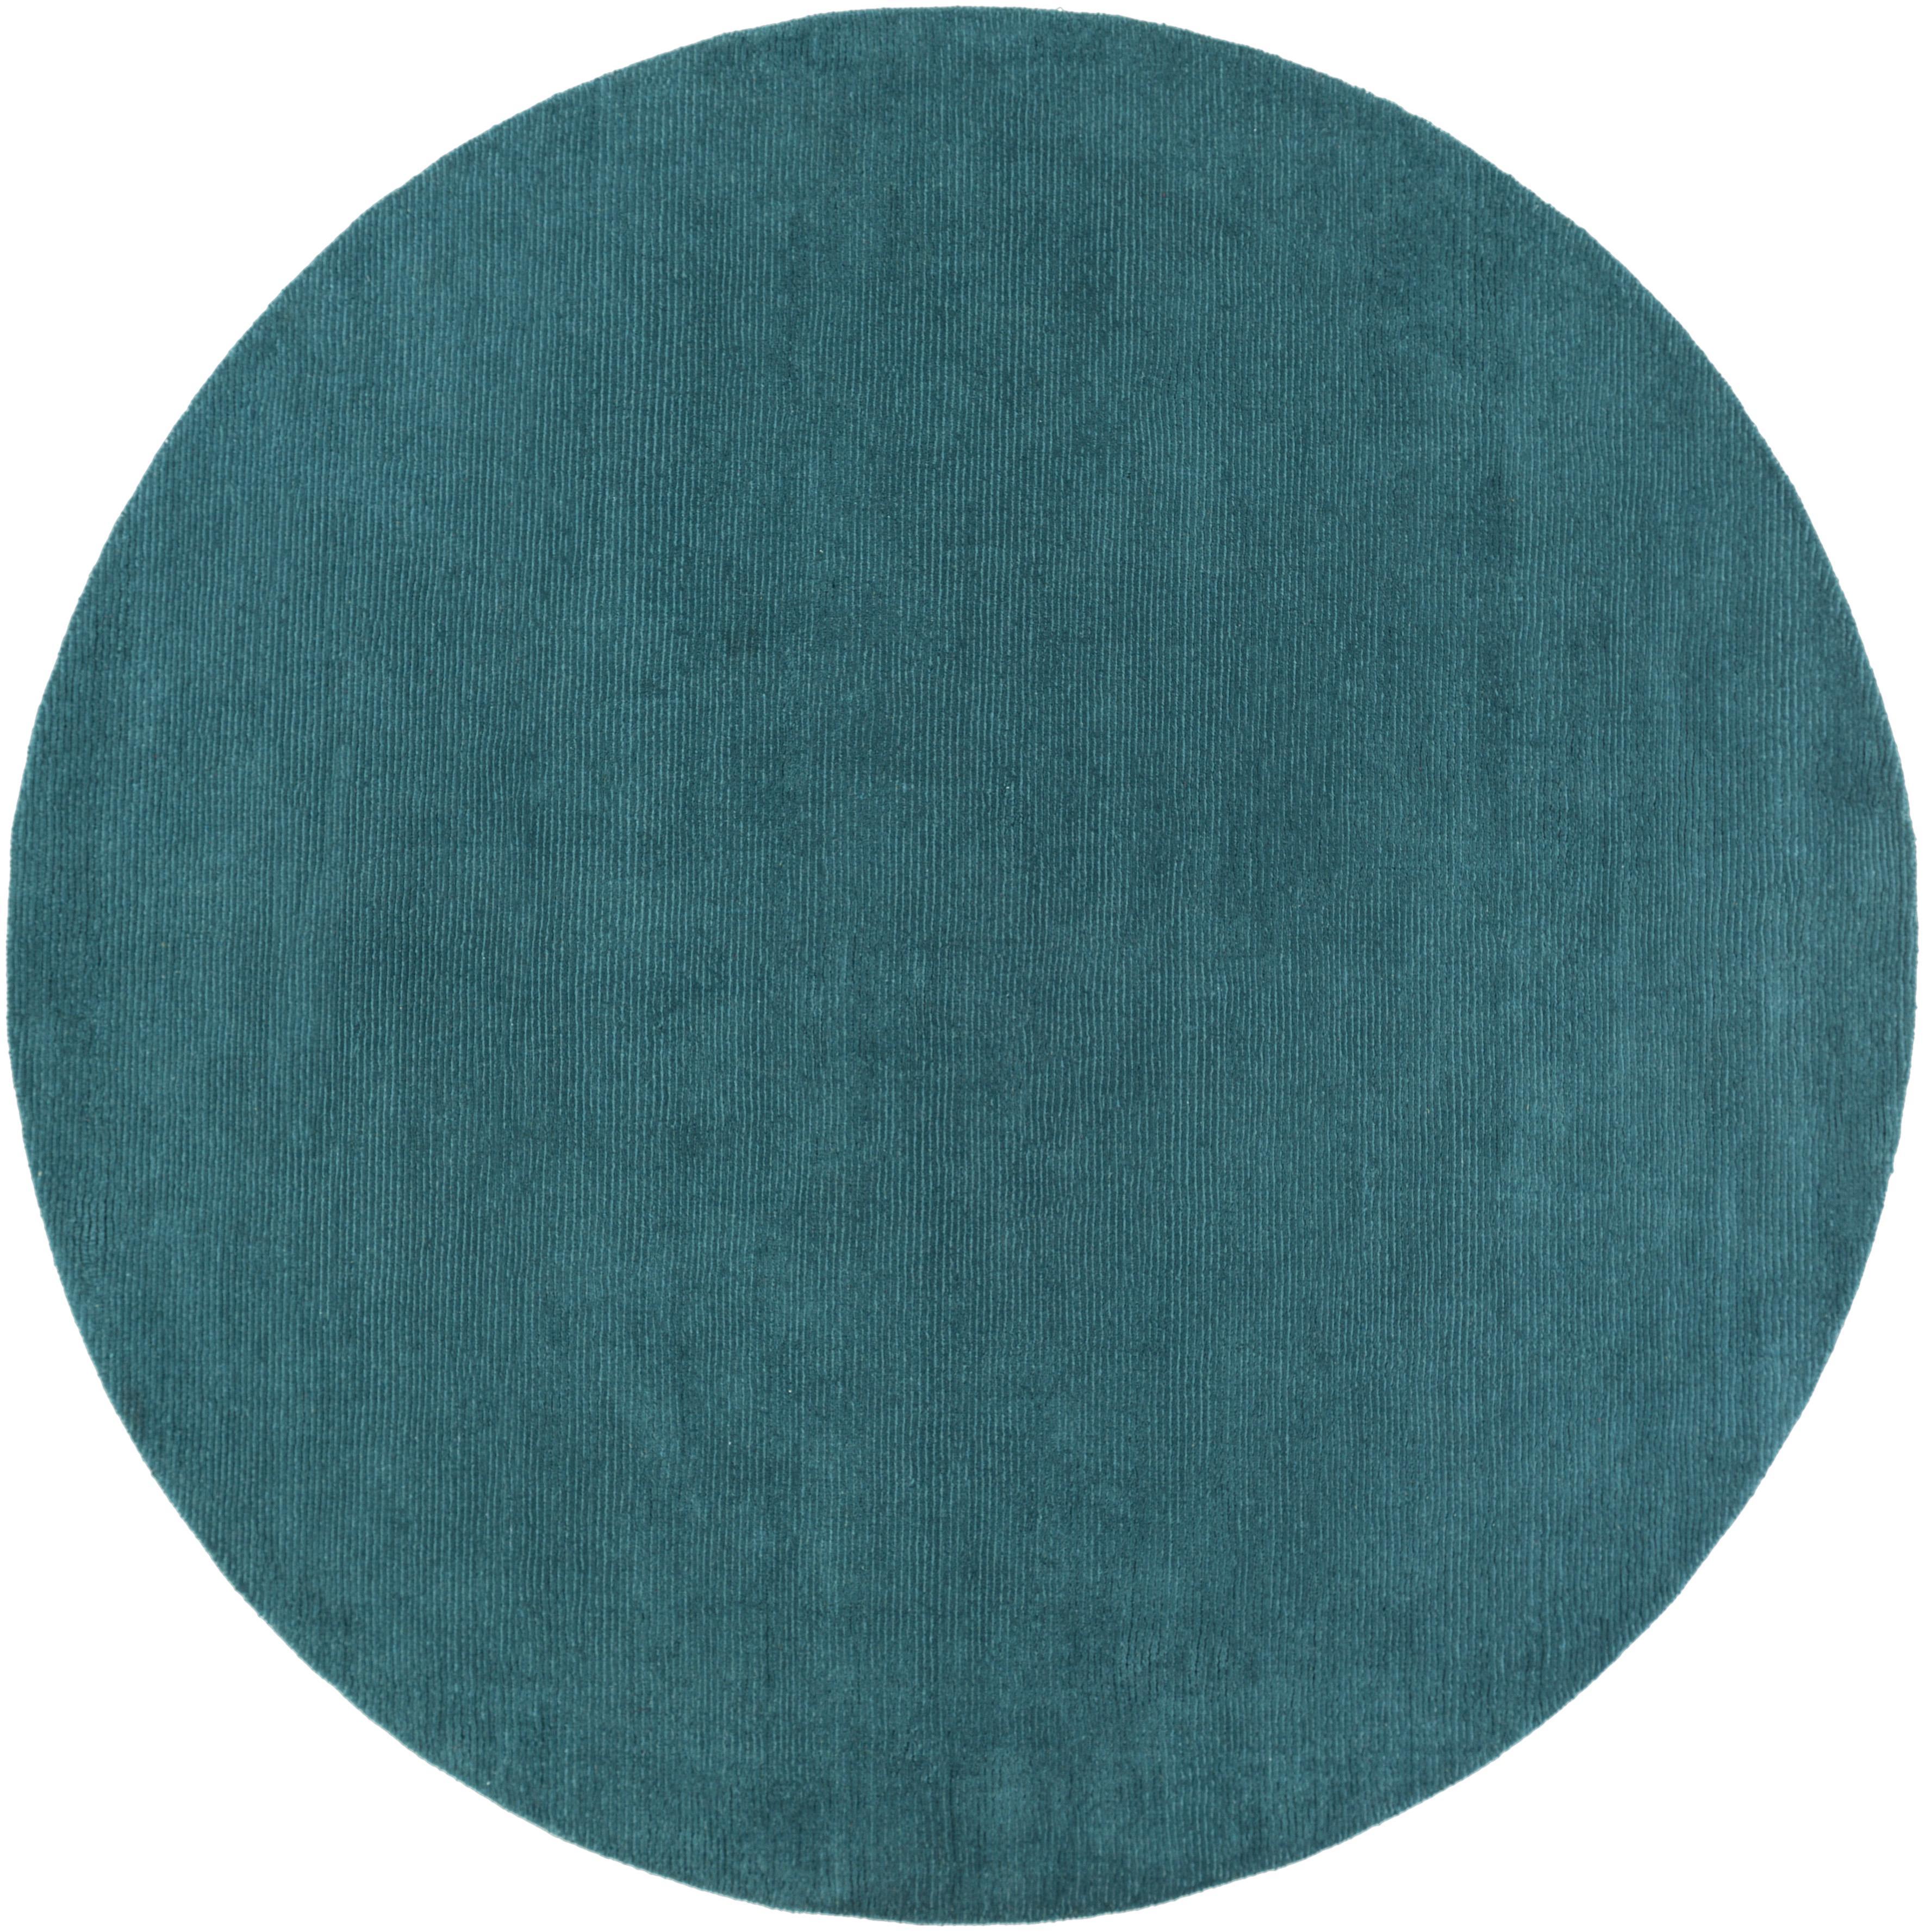 Surya Rugs Mystique 6' Round - Item Number: M5330-6RD